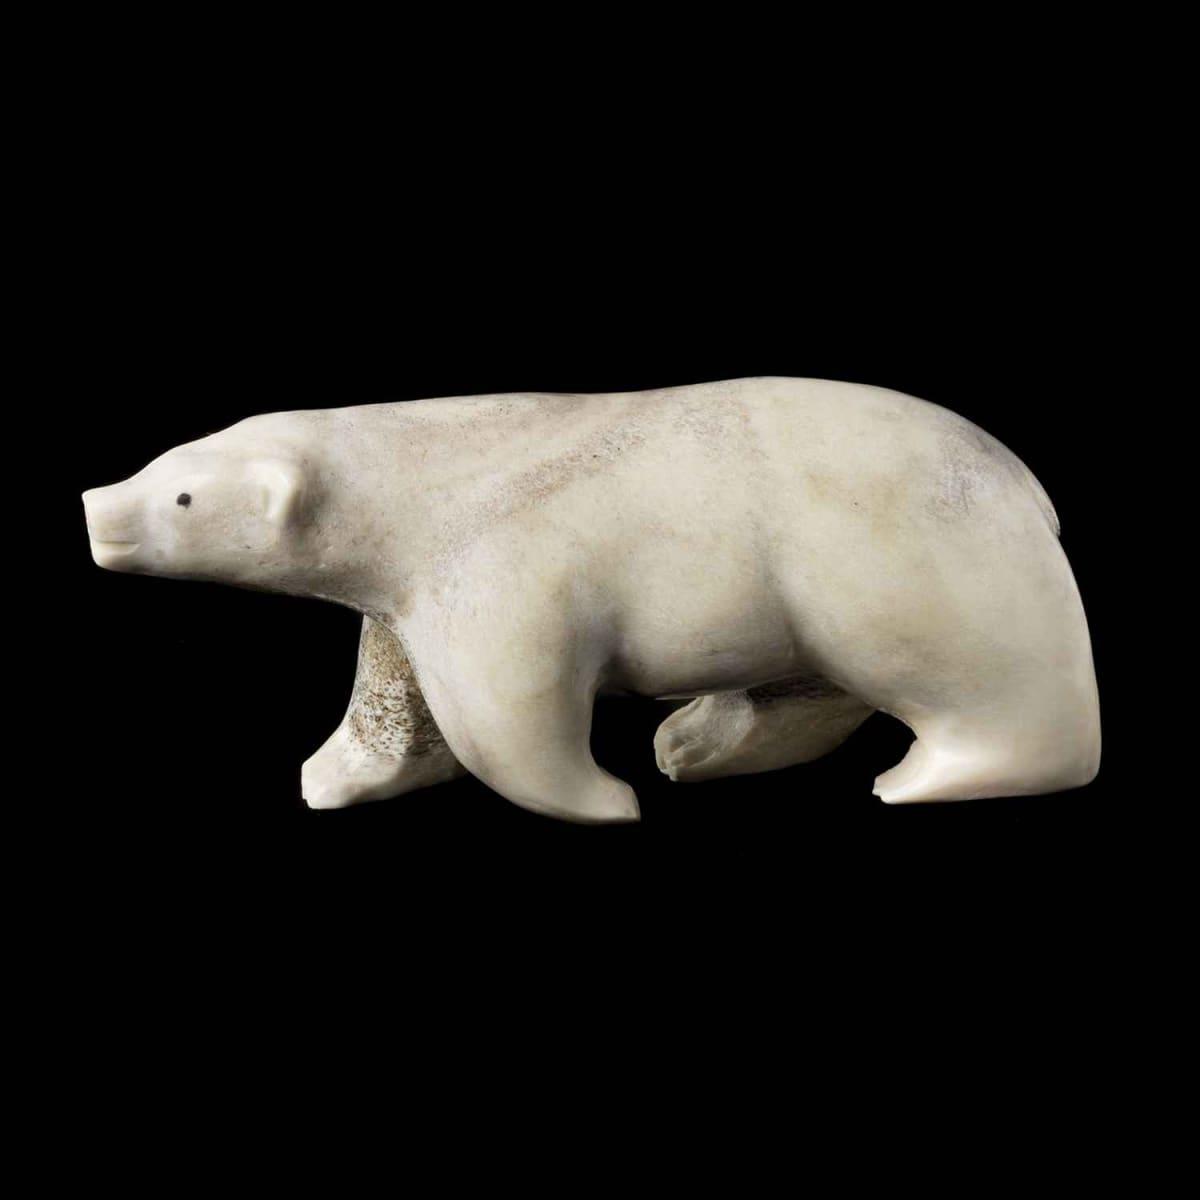 24. UNIDENTIFIED ARTIST, CAPE DORSET Walking Polar Bear, 1982 SOLD